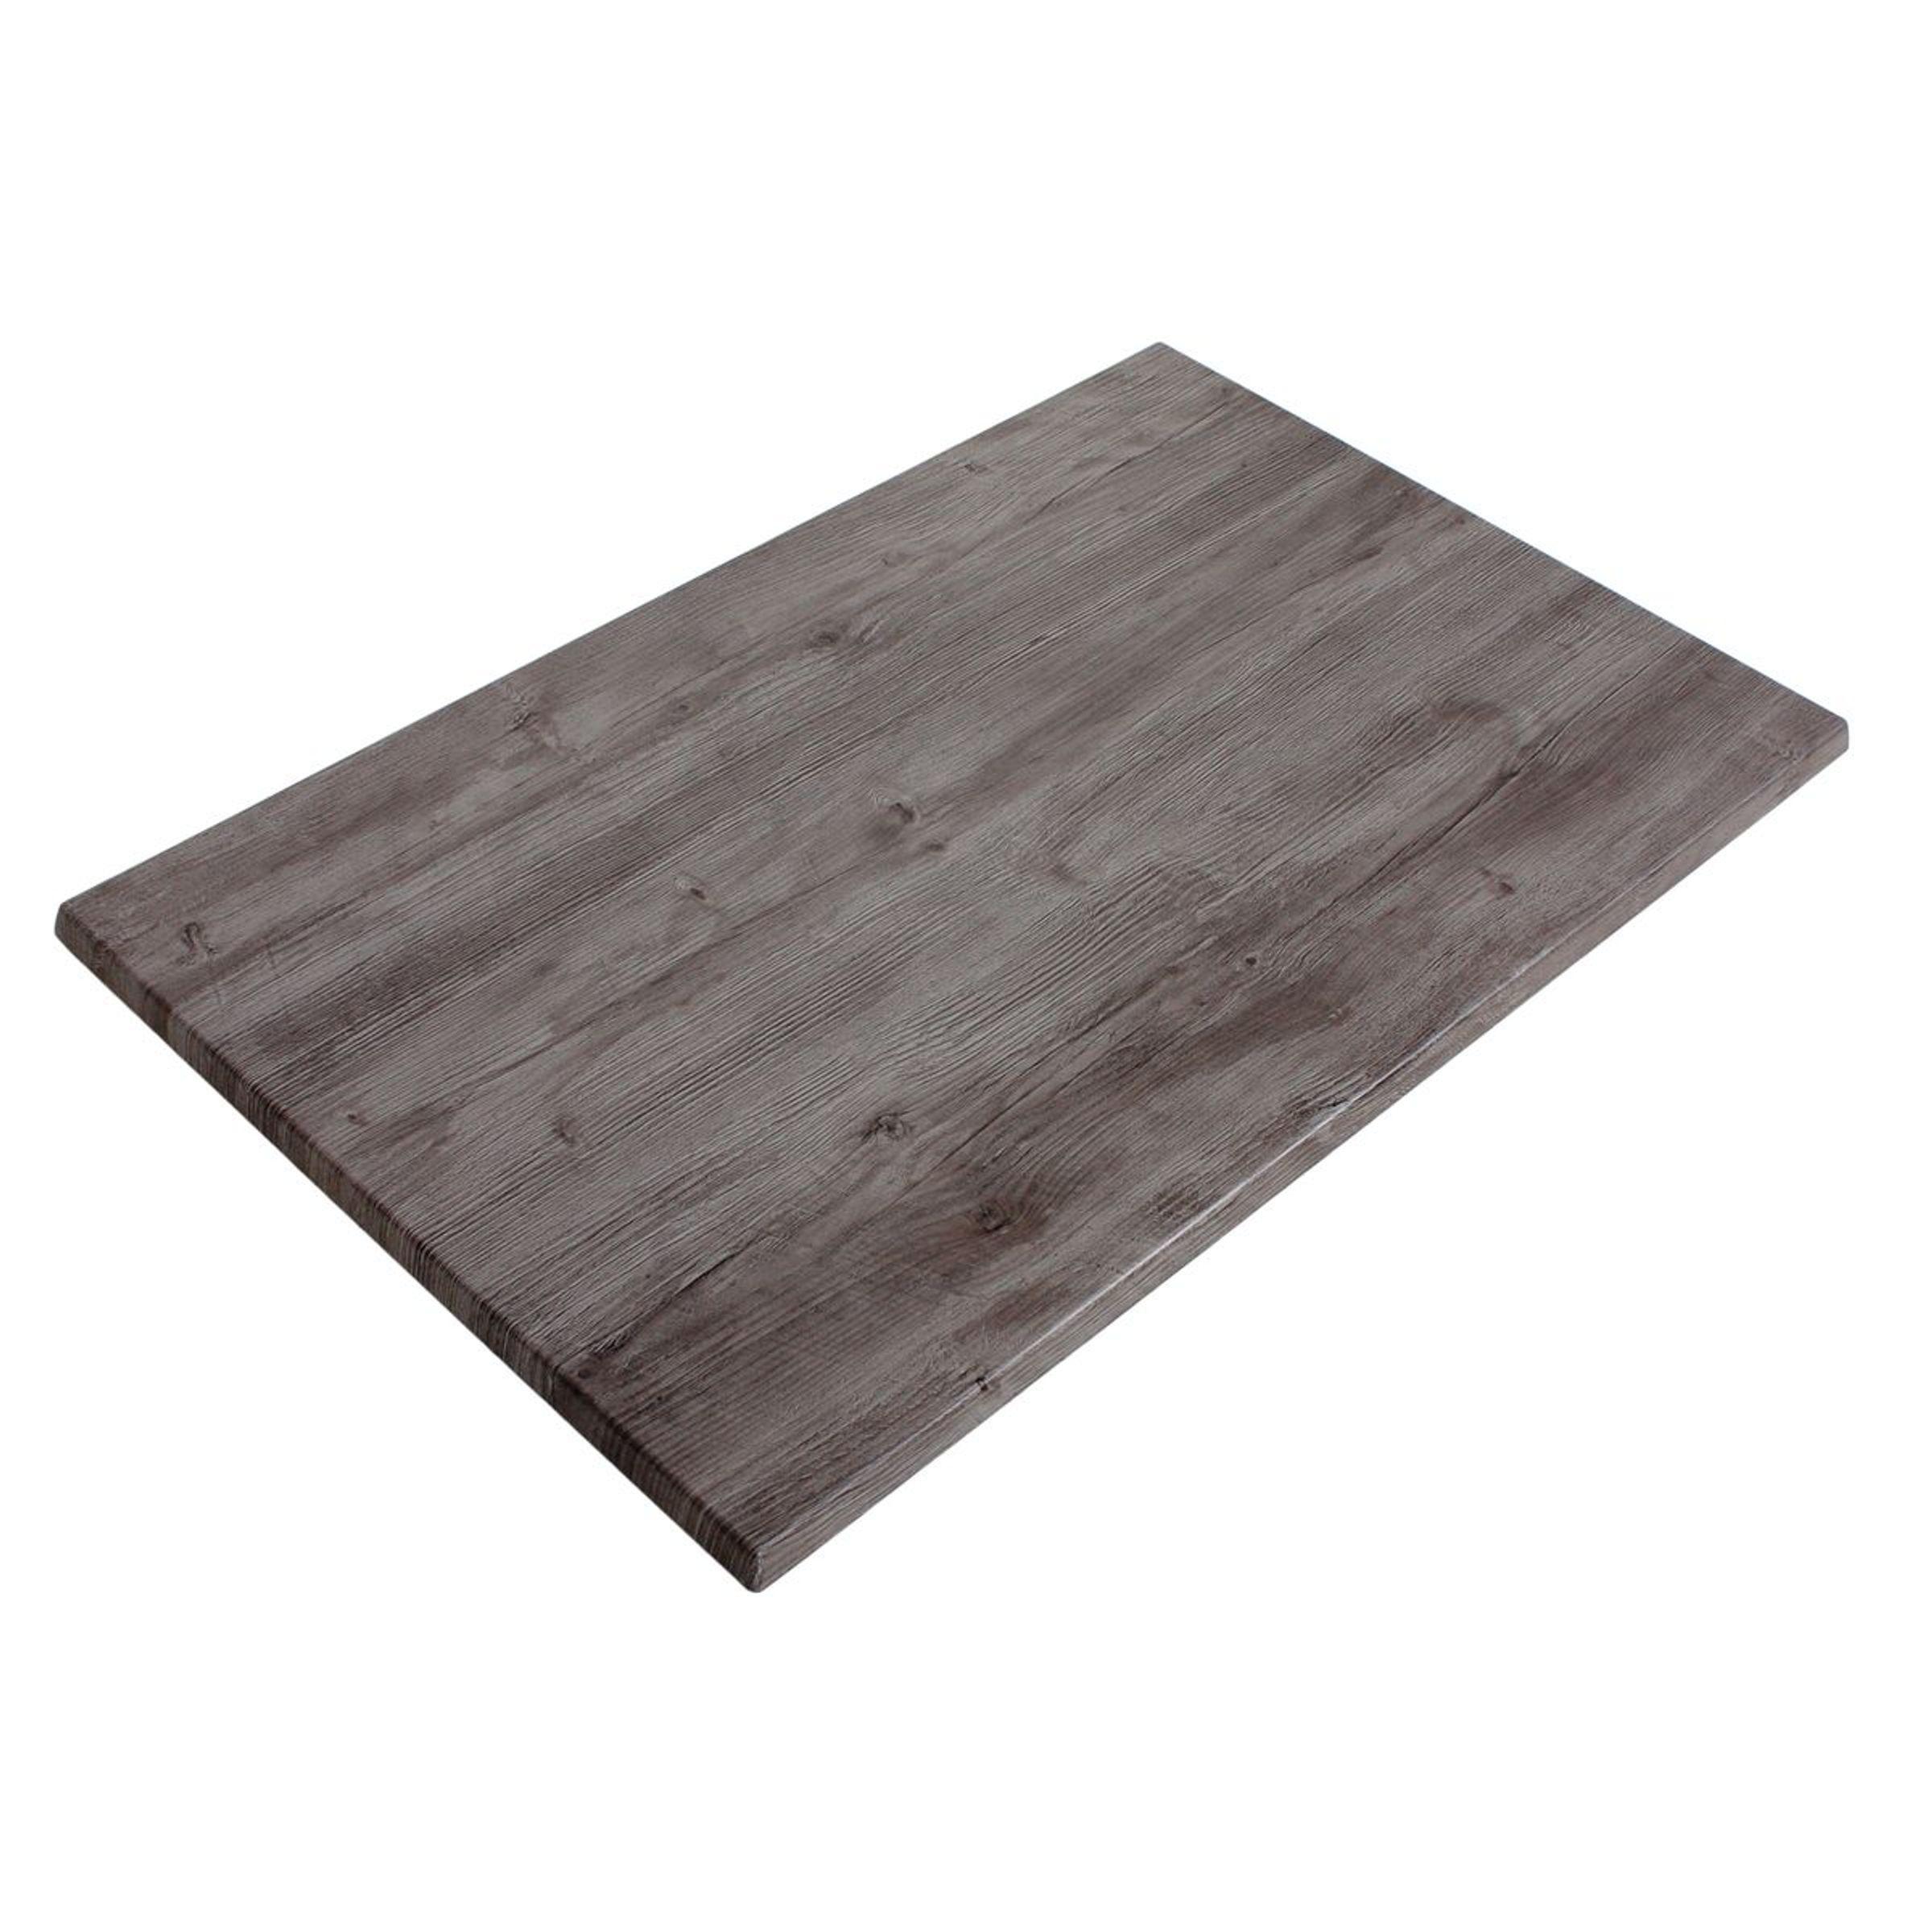 Tischplatte Gartentisch Platte Tisch Garten Grau 110x70 cm Garten ...